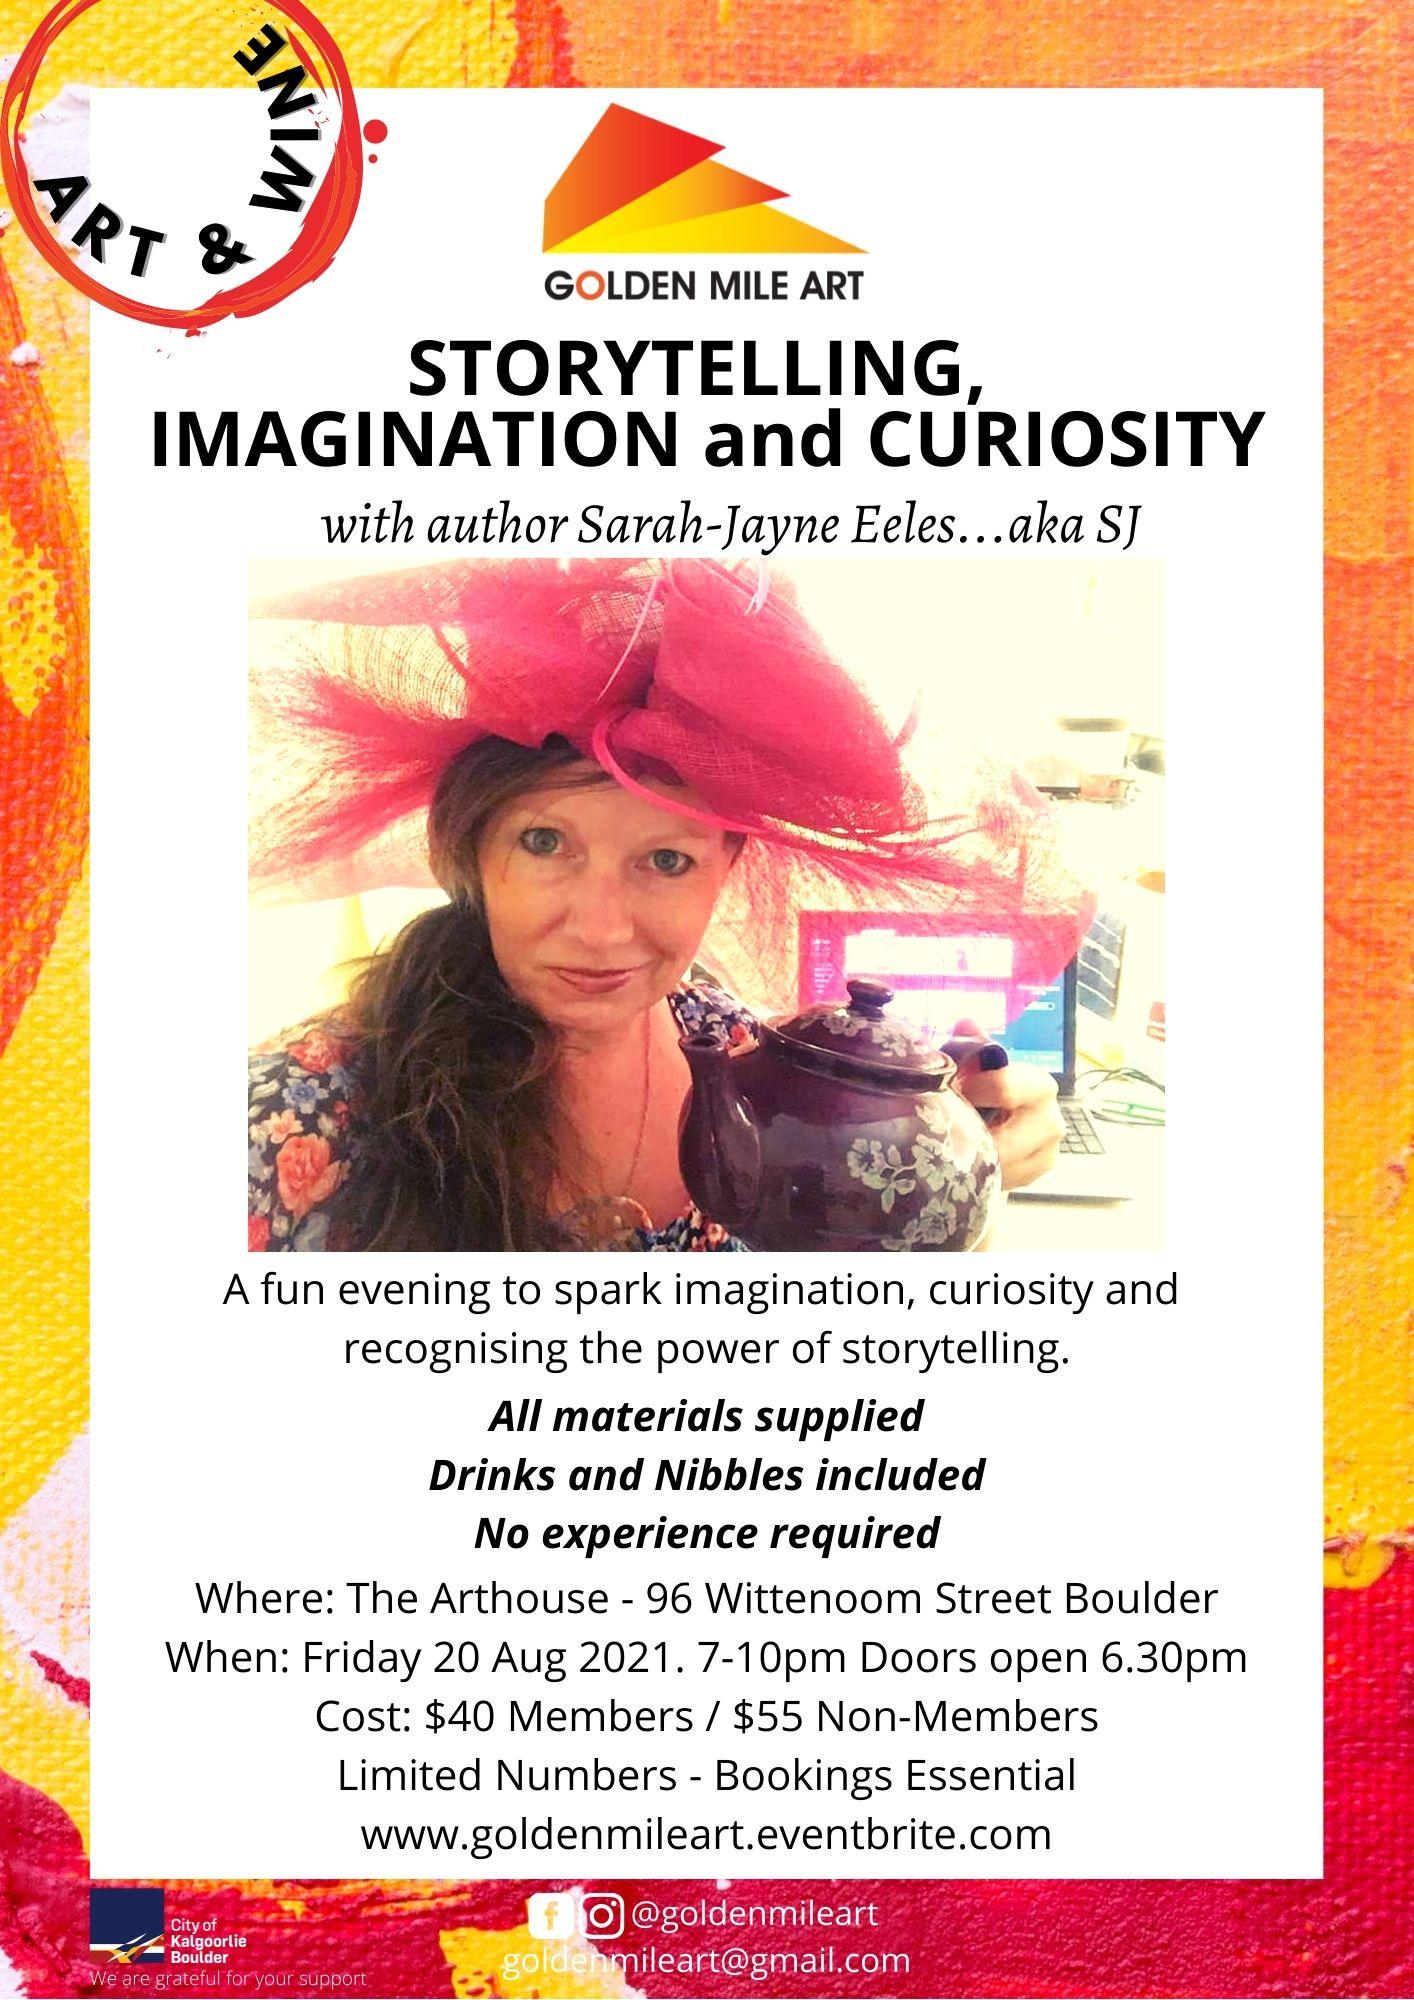 Storytelling, Imagination and Curiosity with Author Sarah-Jayne Eeles...aka SJ